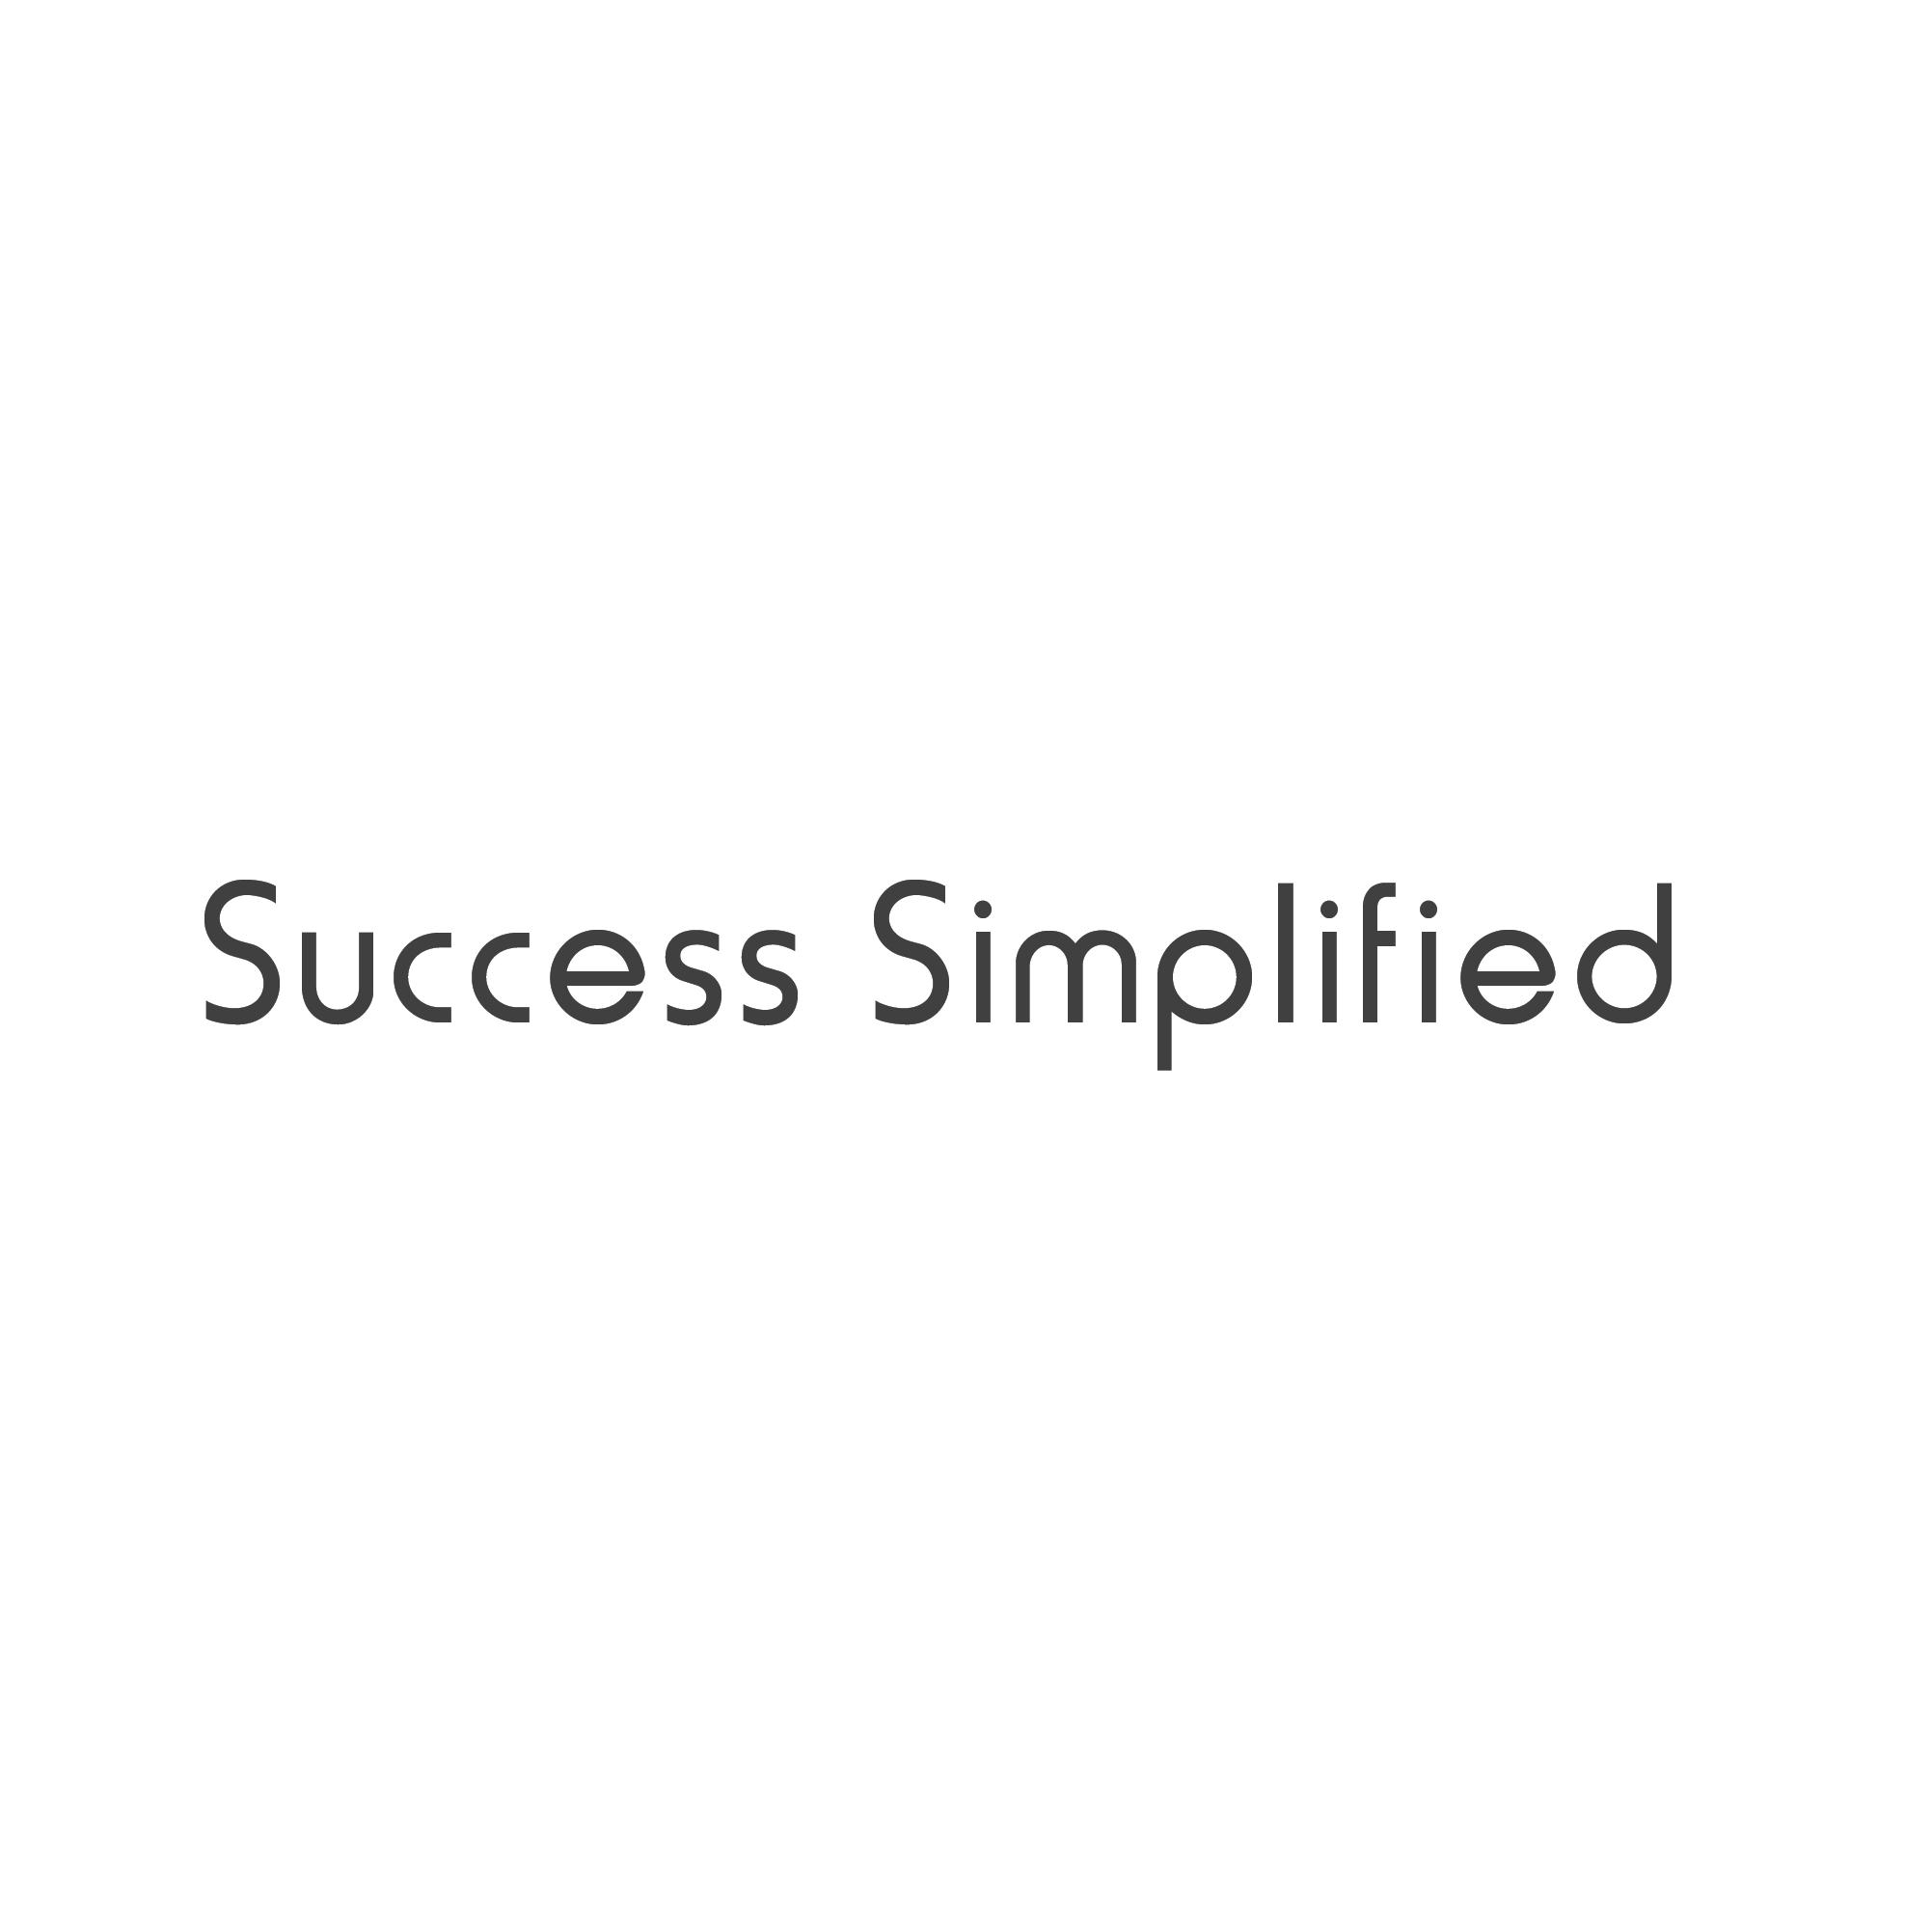 Heardat-bannerSuccess Simplified-50op white block2002